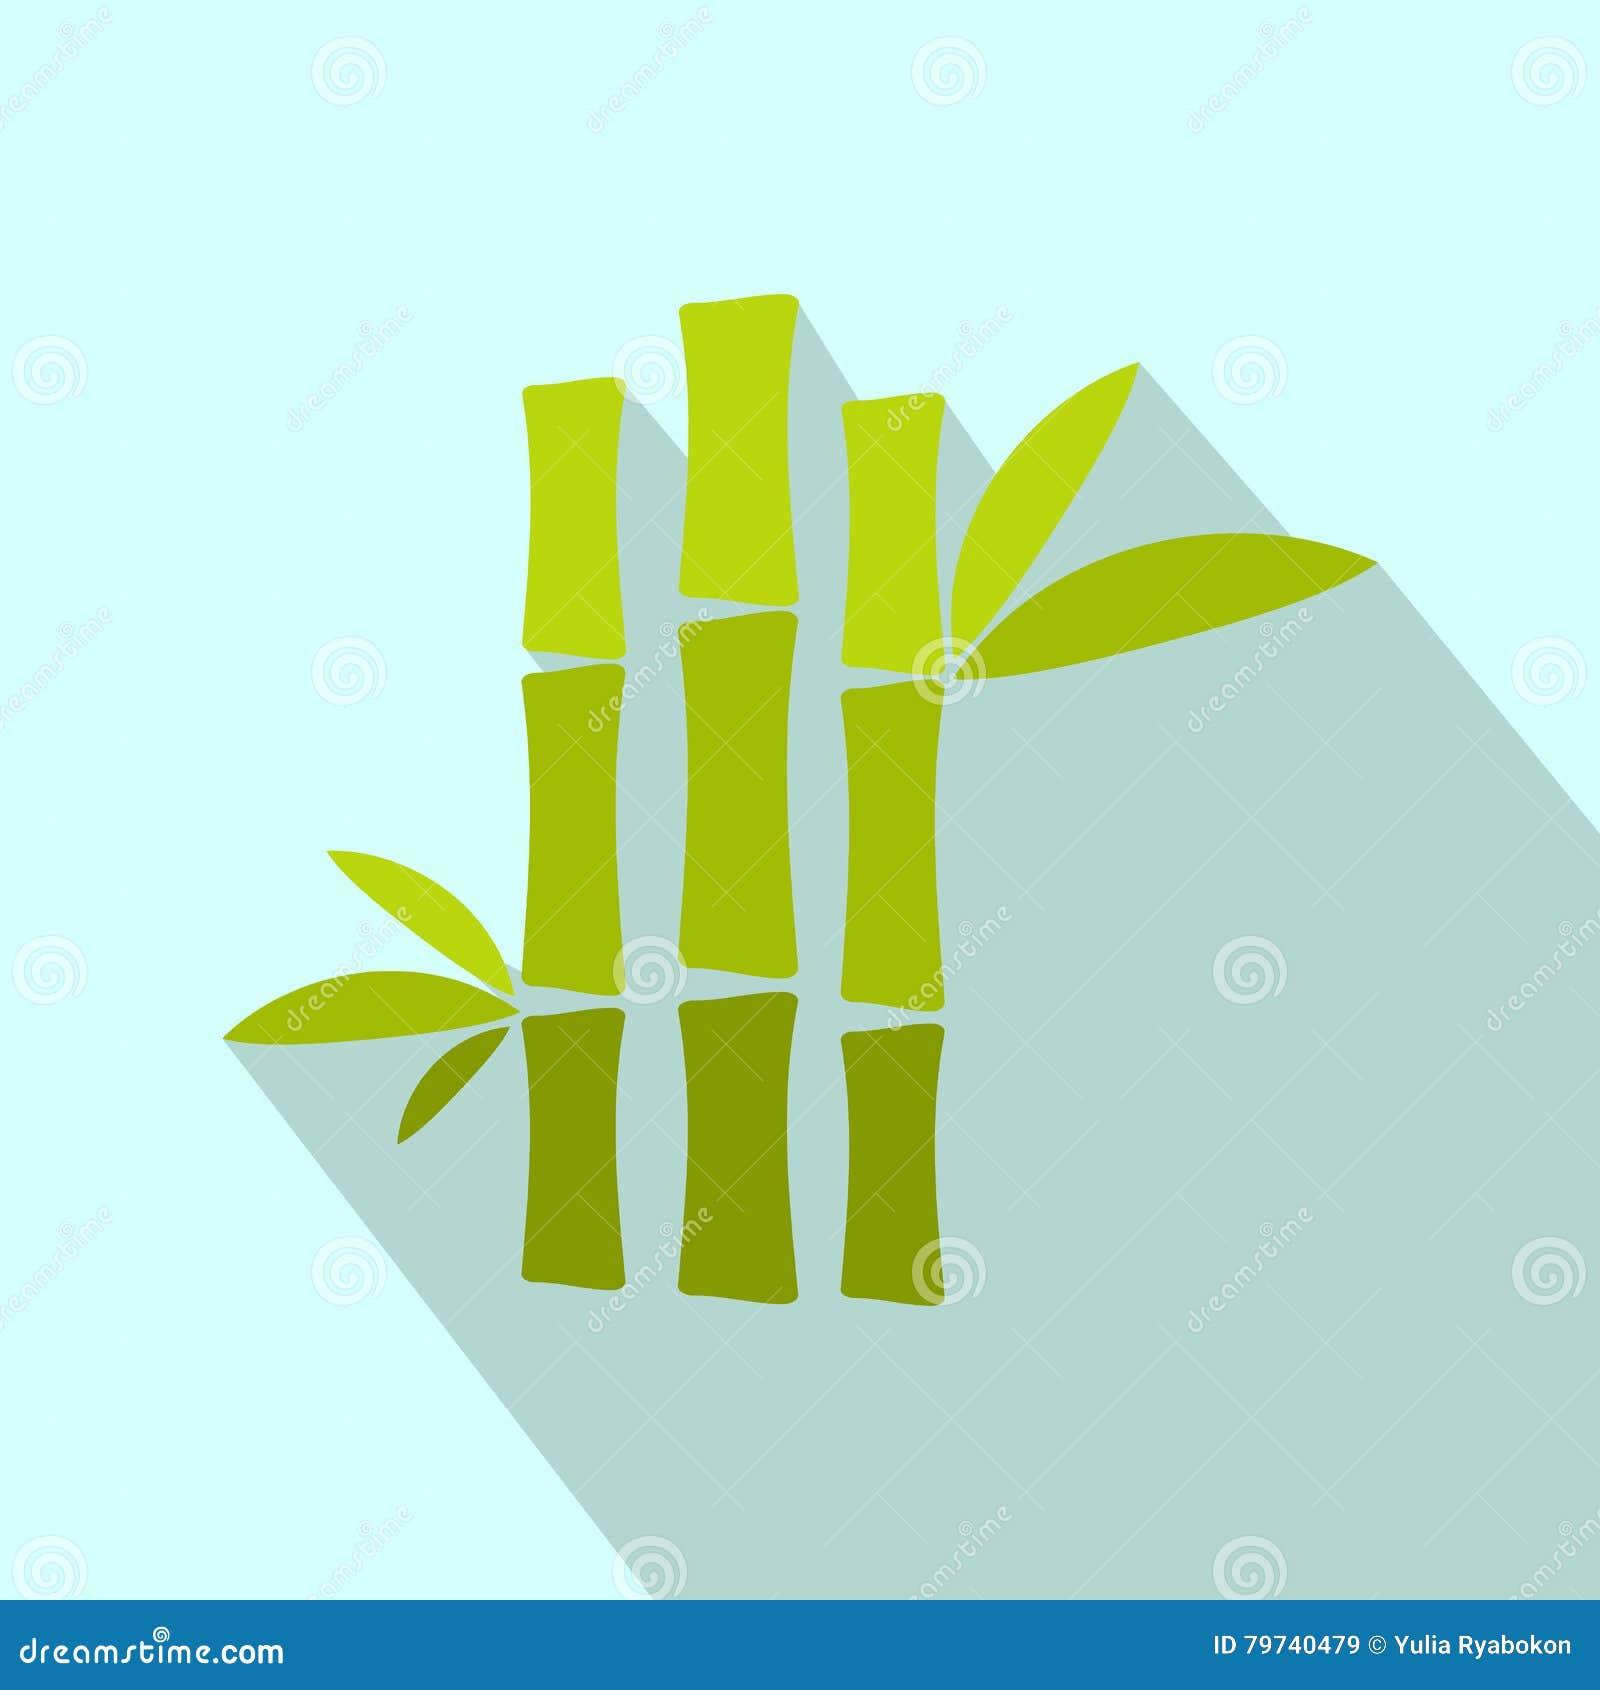 Icono plano del tronco de bambú verde